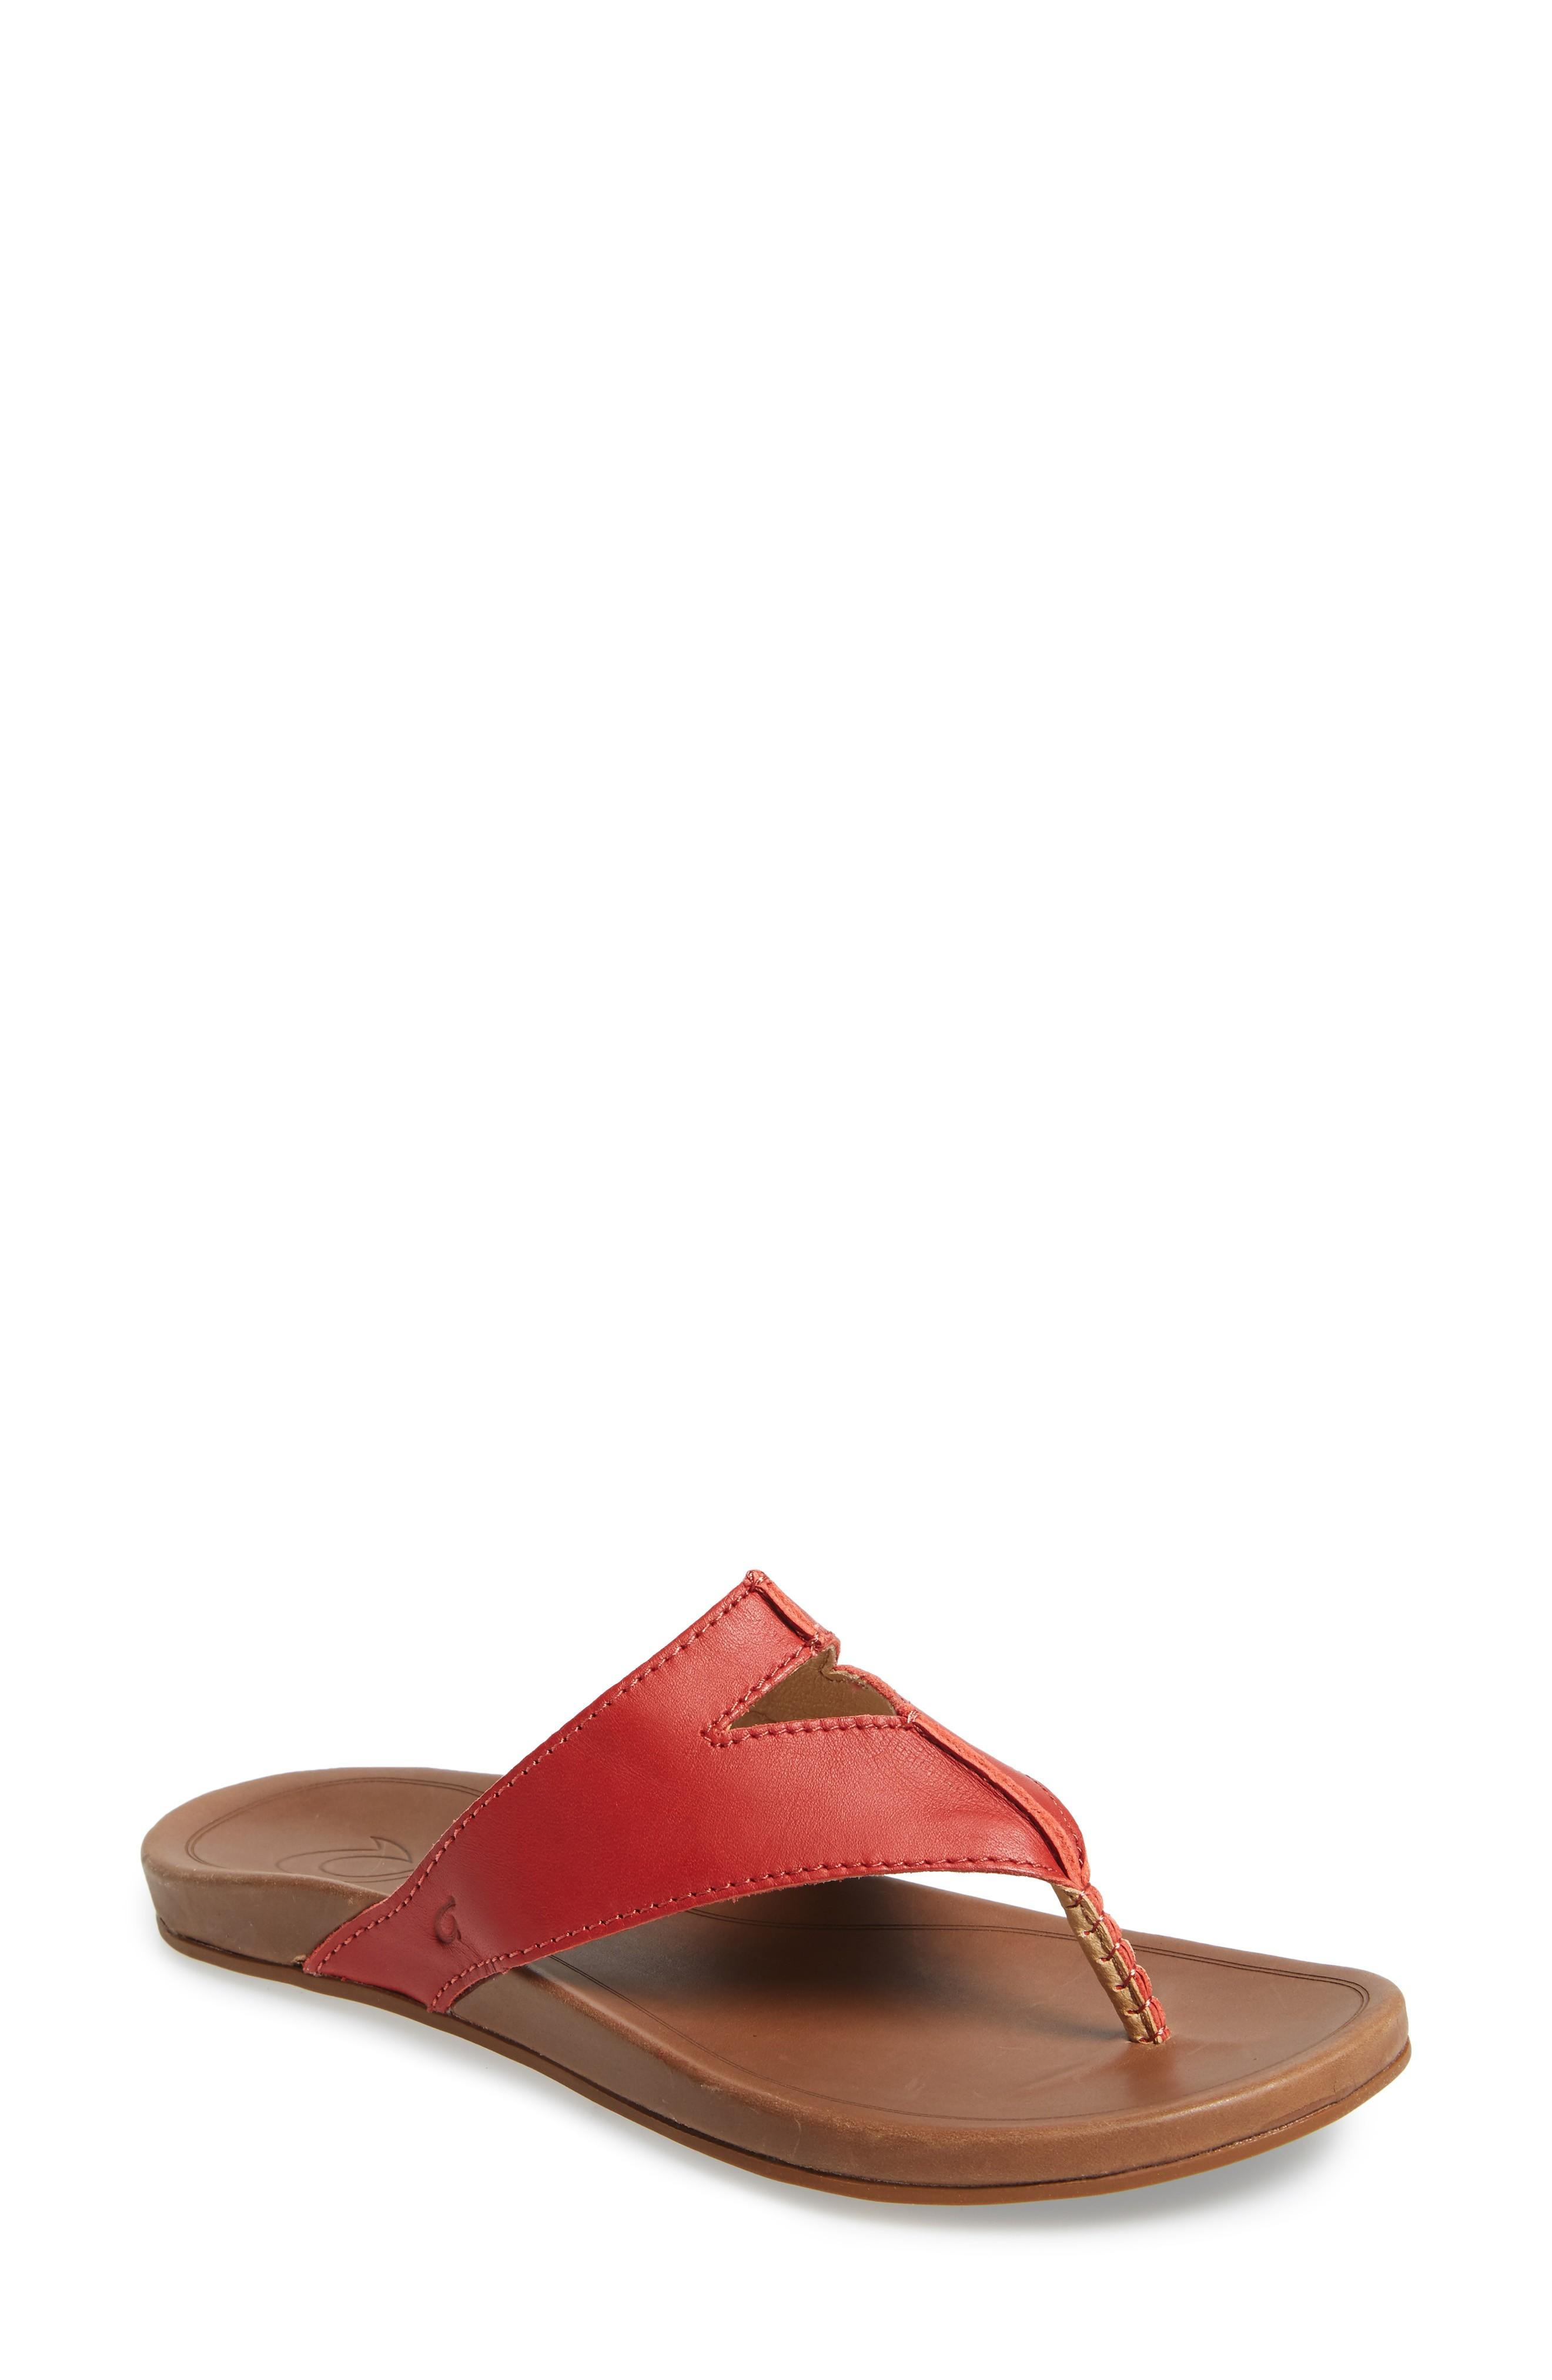 de833b25e19 Olukai Lala Flip Flop In Paprika  Tan Leather